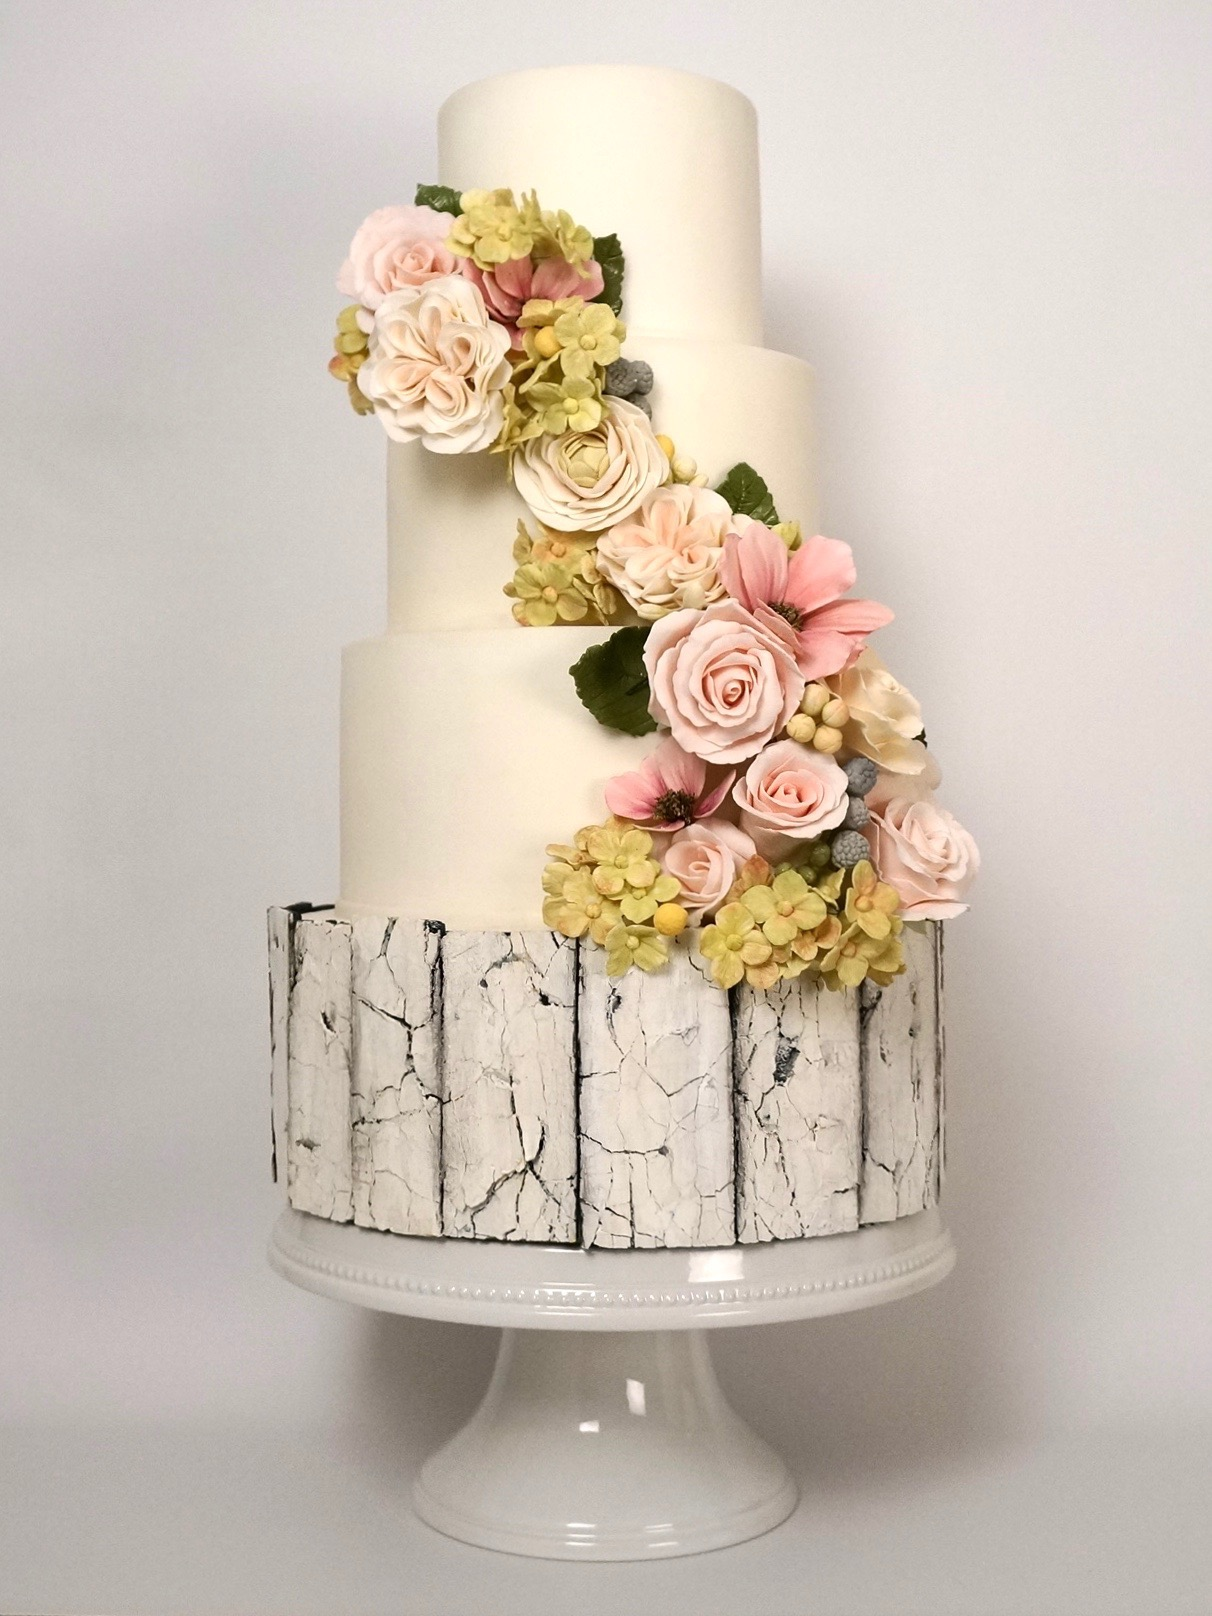 rustic-aged-wood-white-rose-floral-gumpaste-flower-pink-pretty-wedding-cake-baltimore-maryland.jpeg